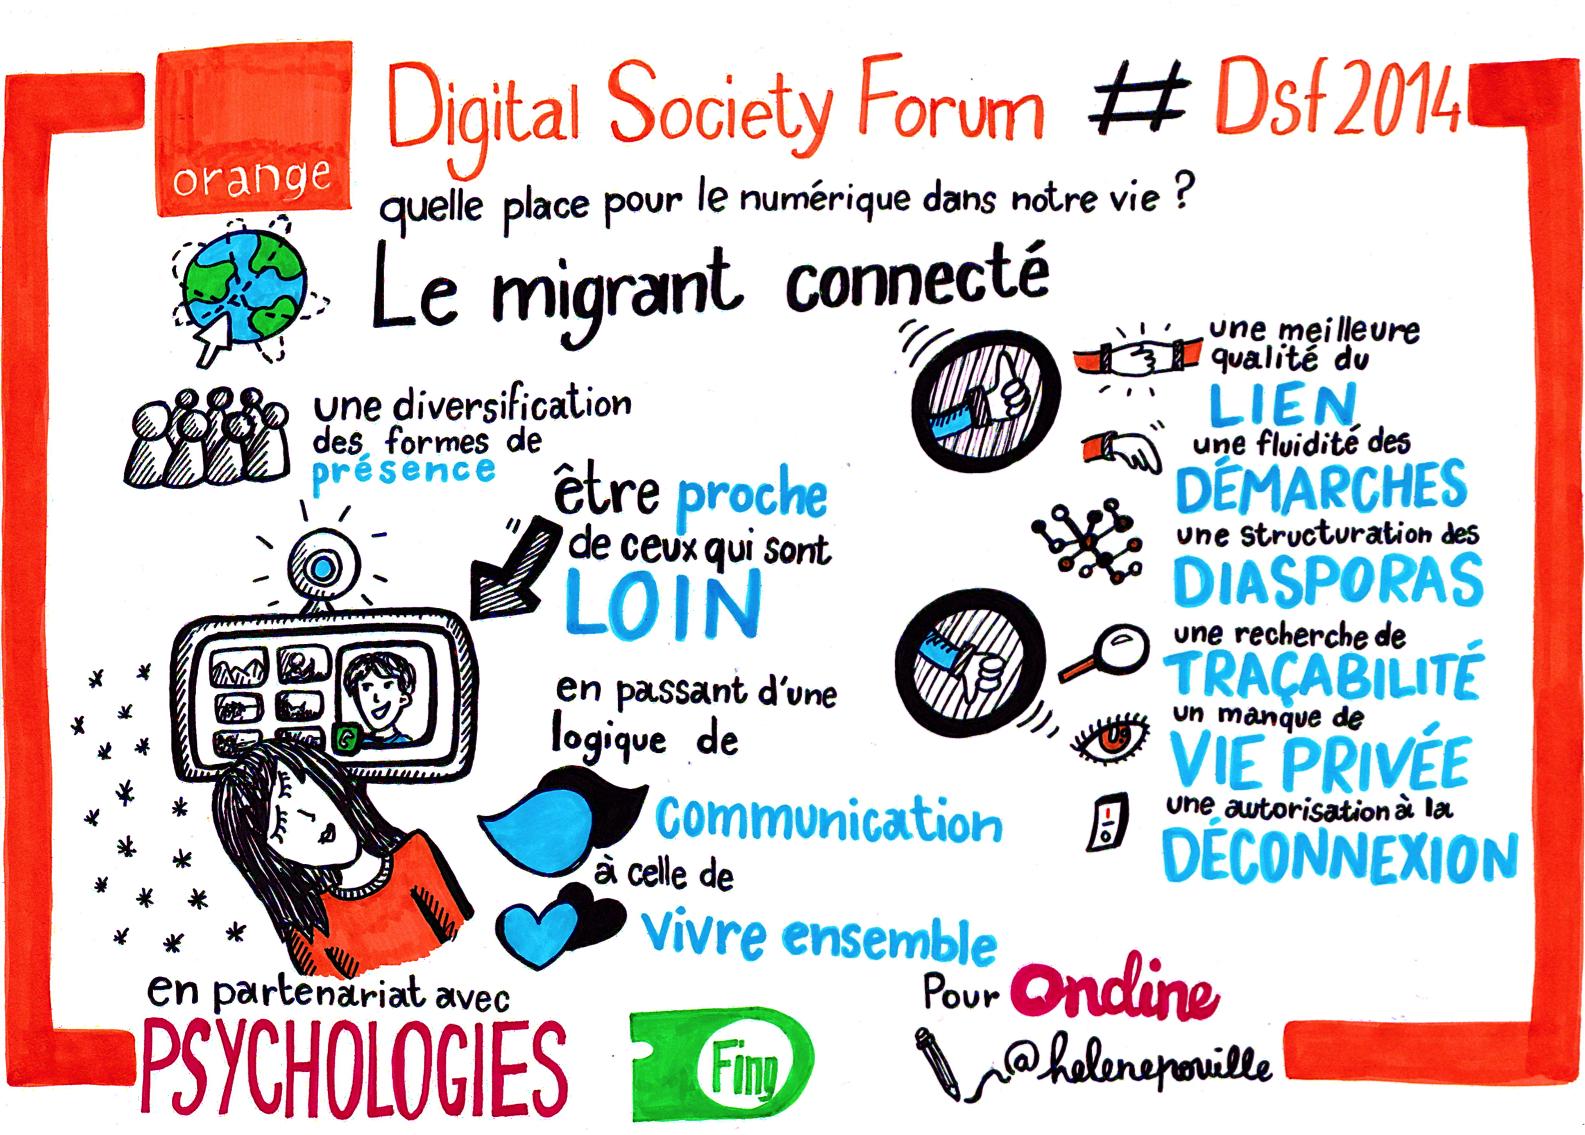 Digital Society Forum - Le migrant connecté